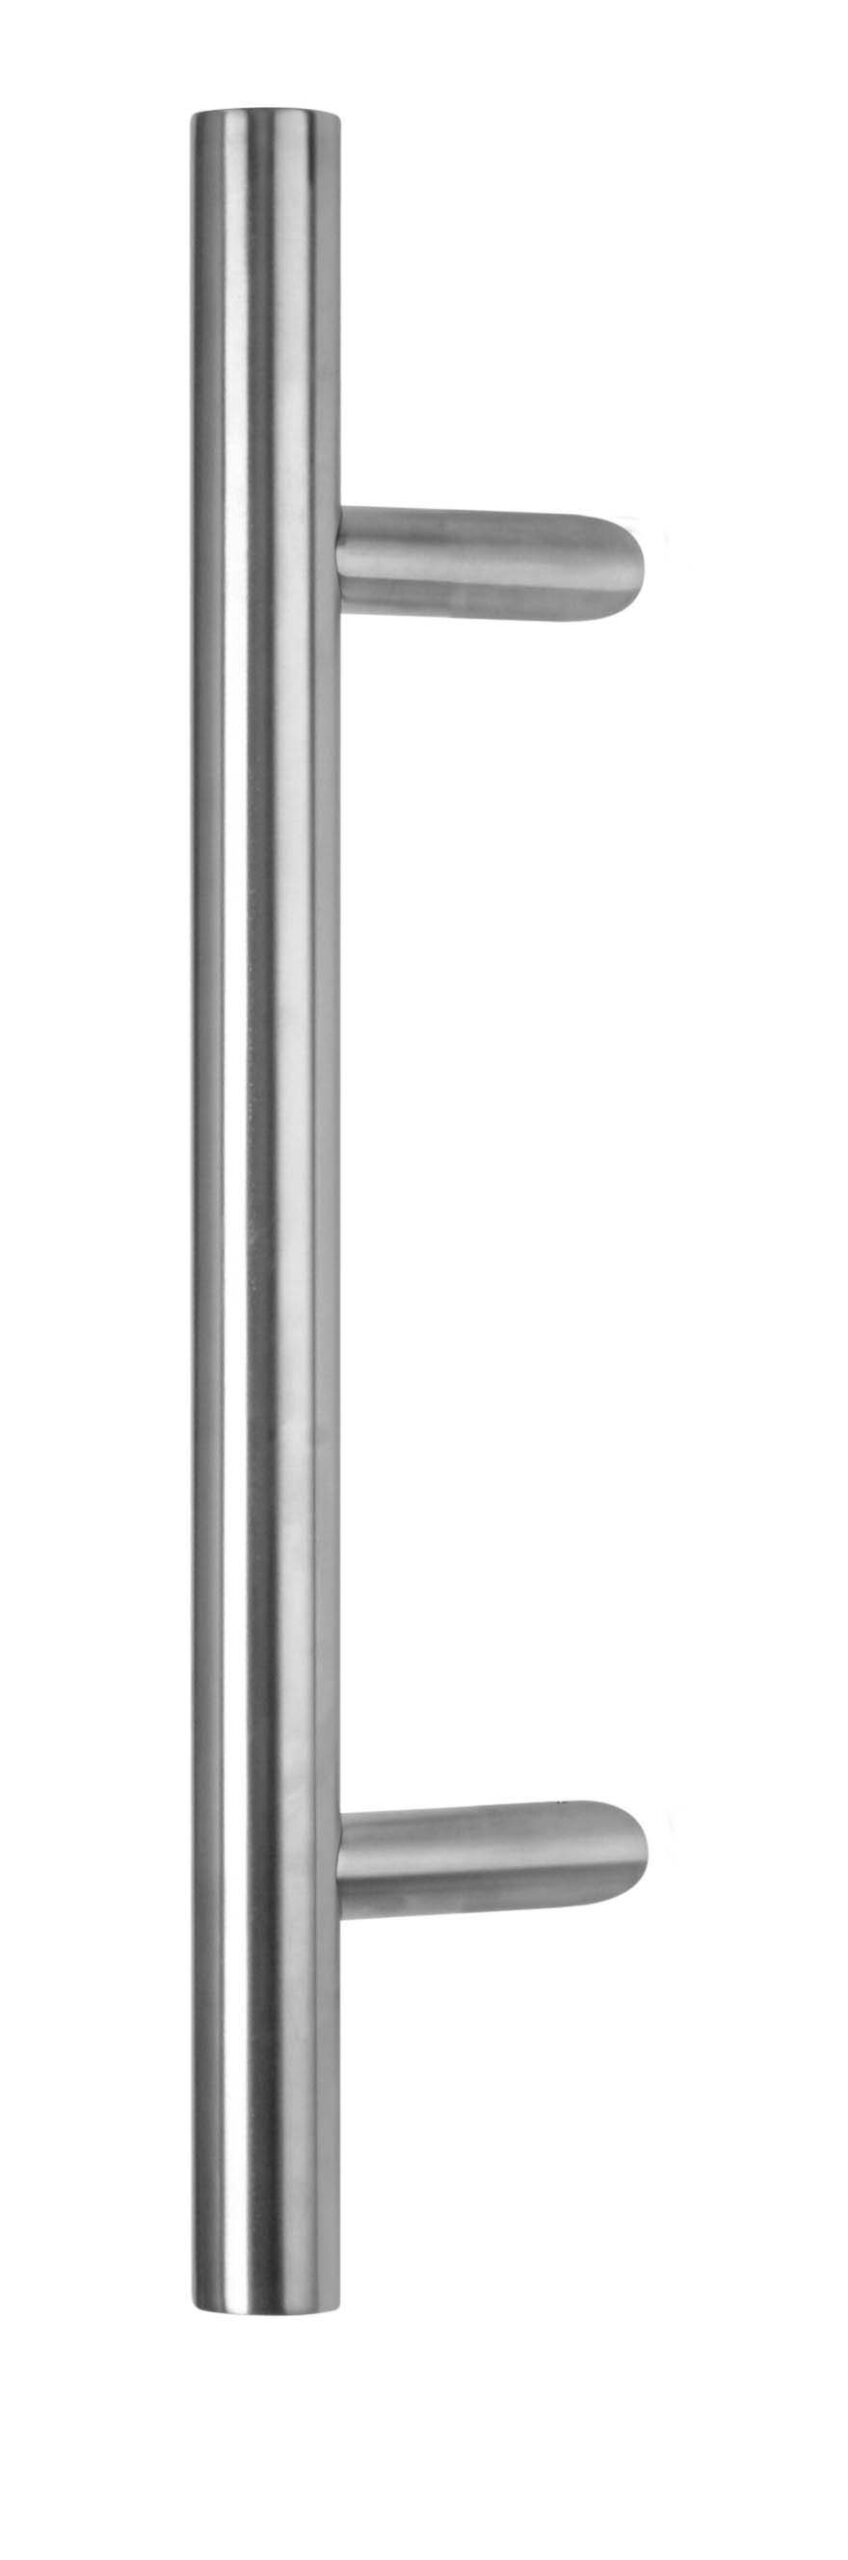 PH006A